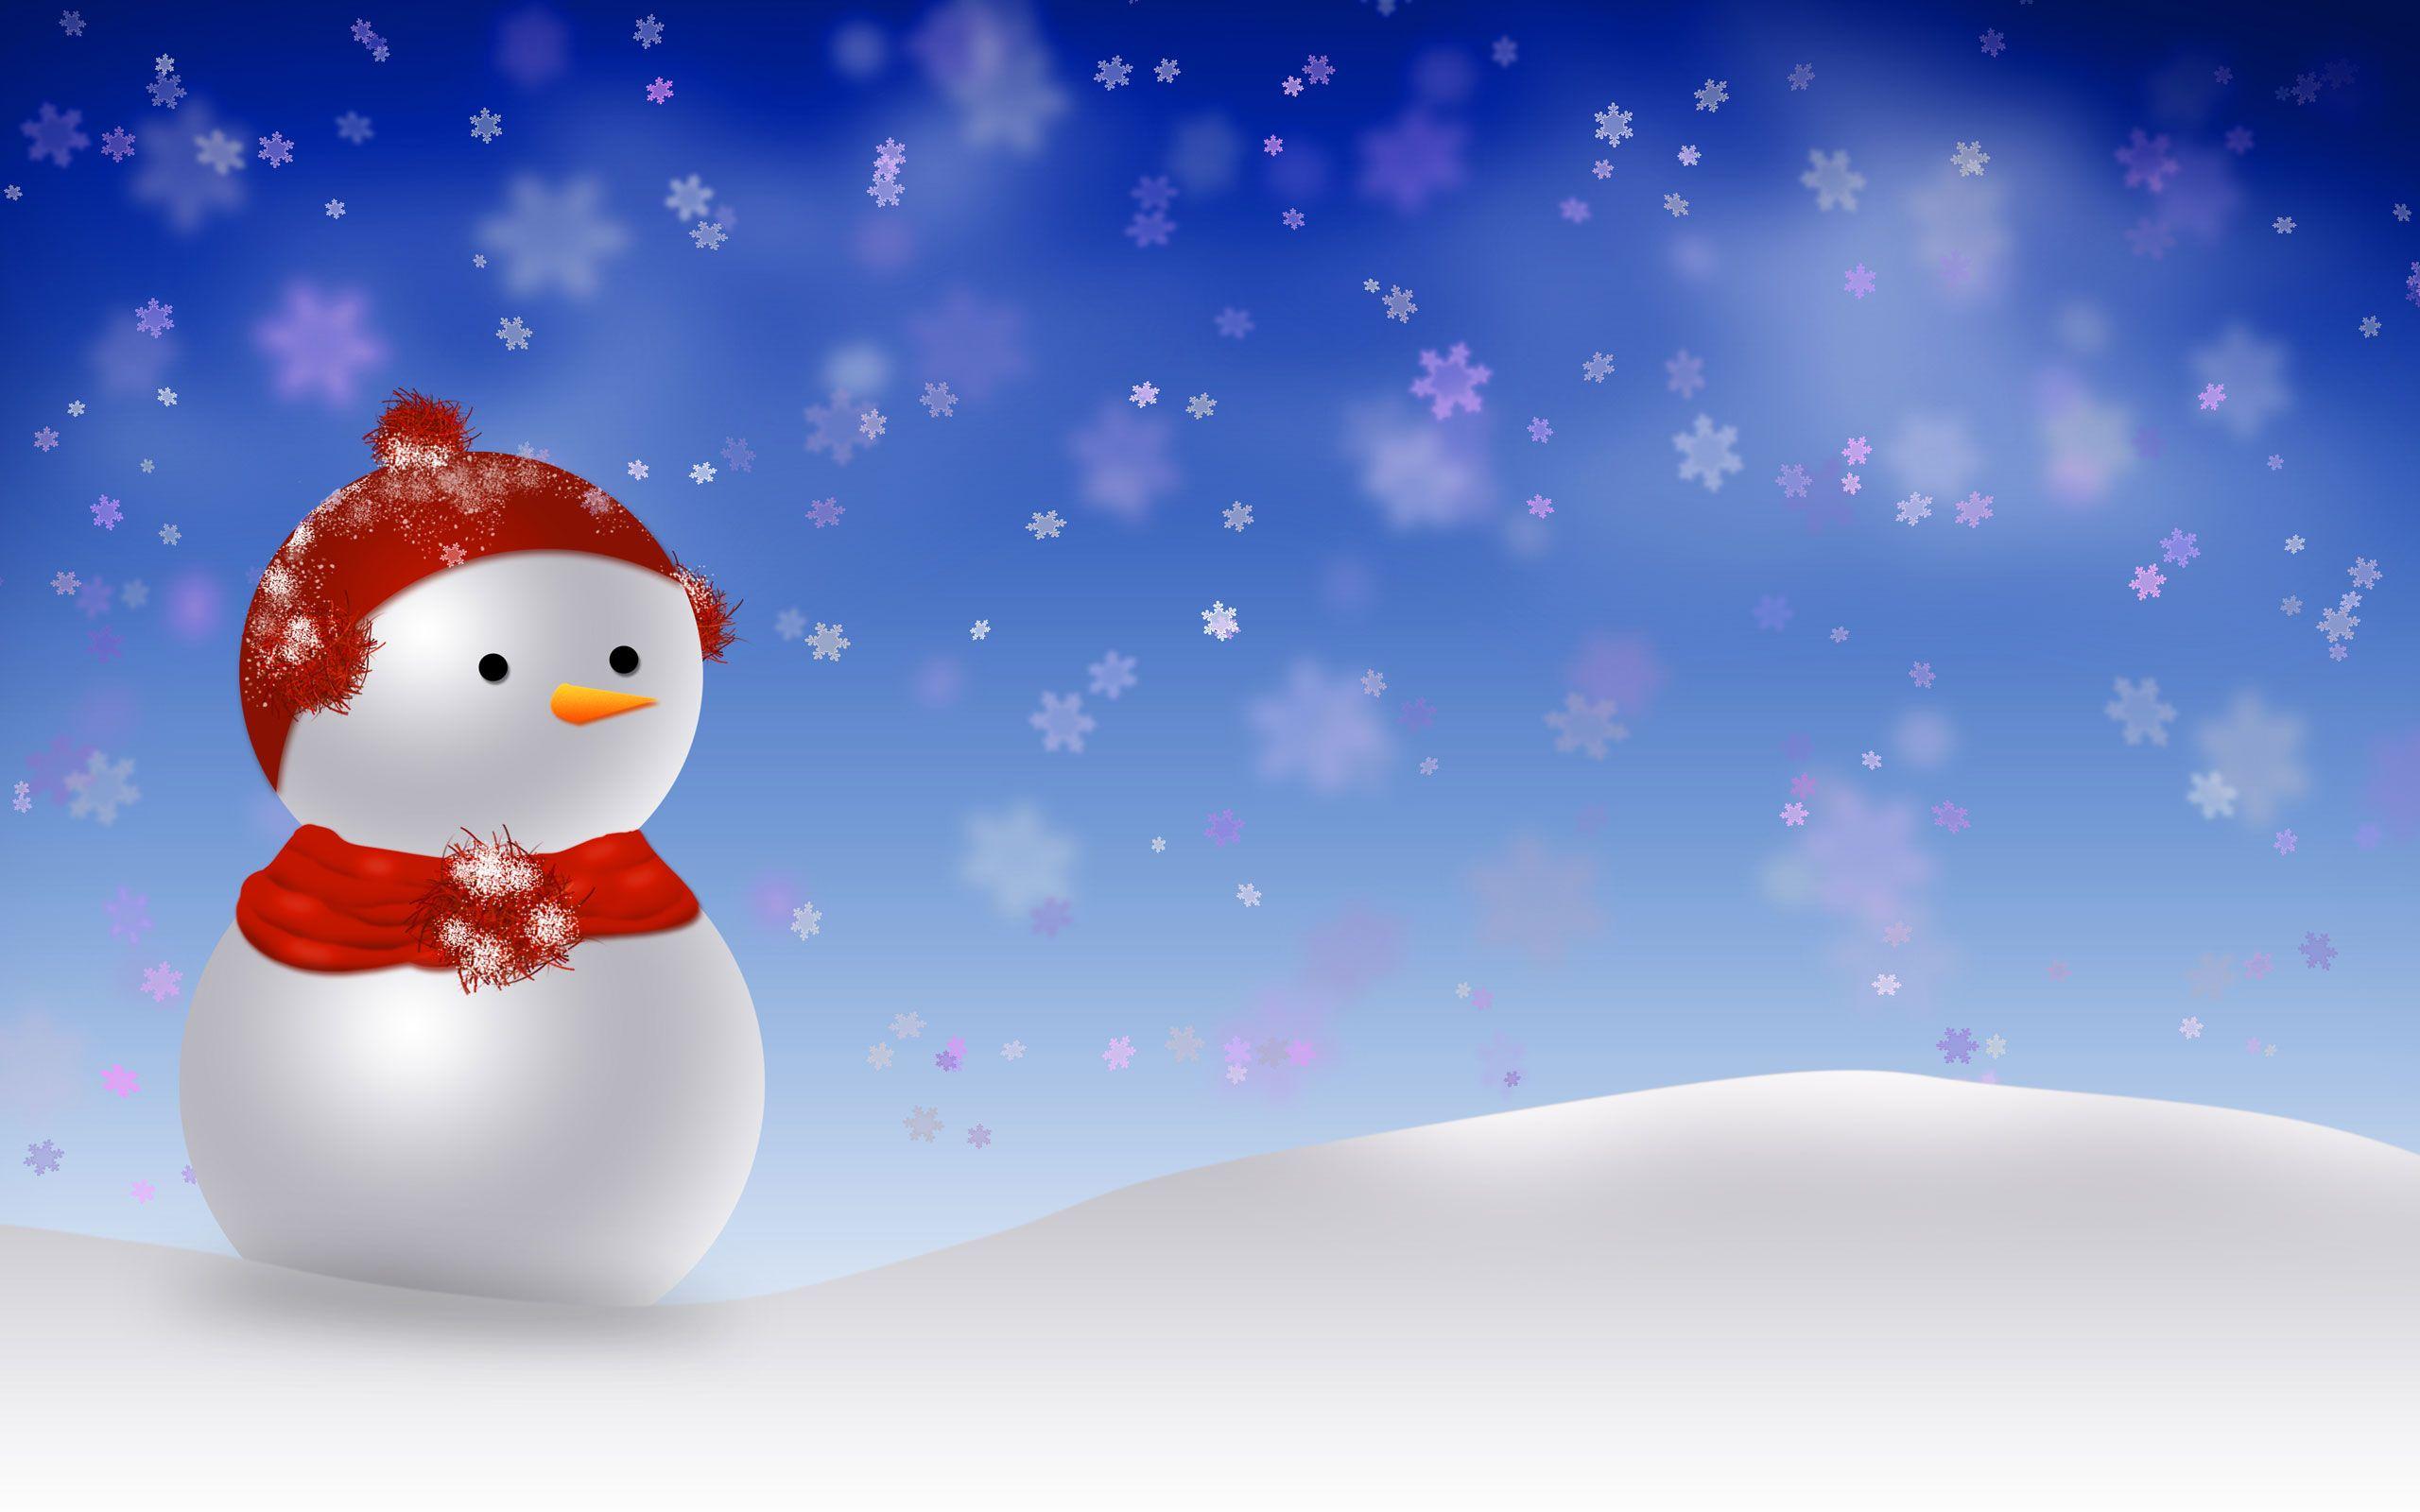 Cute Christmas Snowman Wallpaper Hd Cute Christmas Backgrounds Animated Christmas Wallpaper Merry Christmas Wallpaper